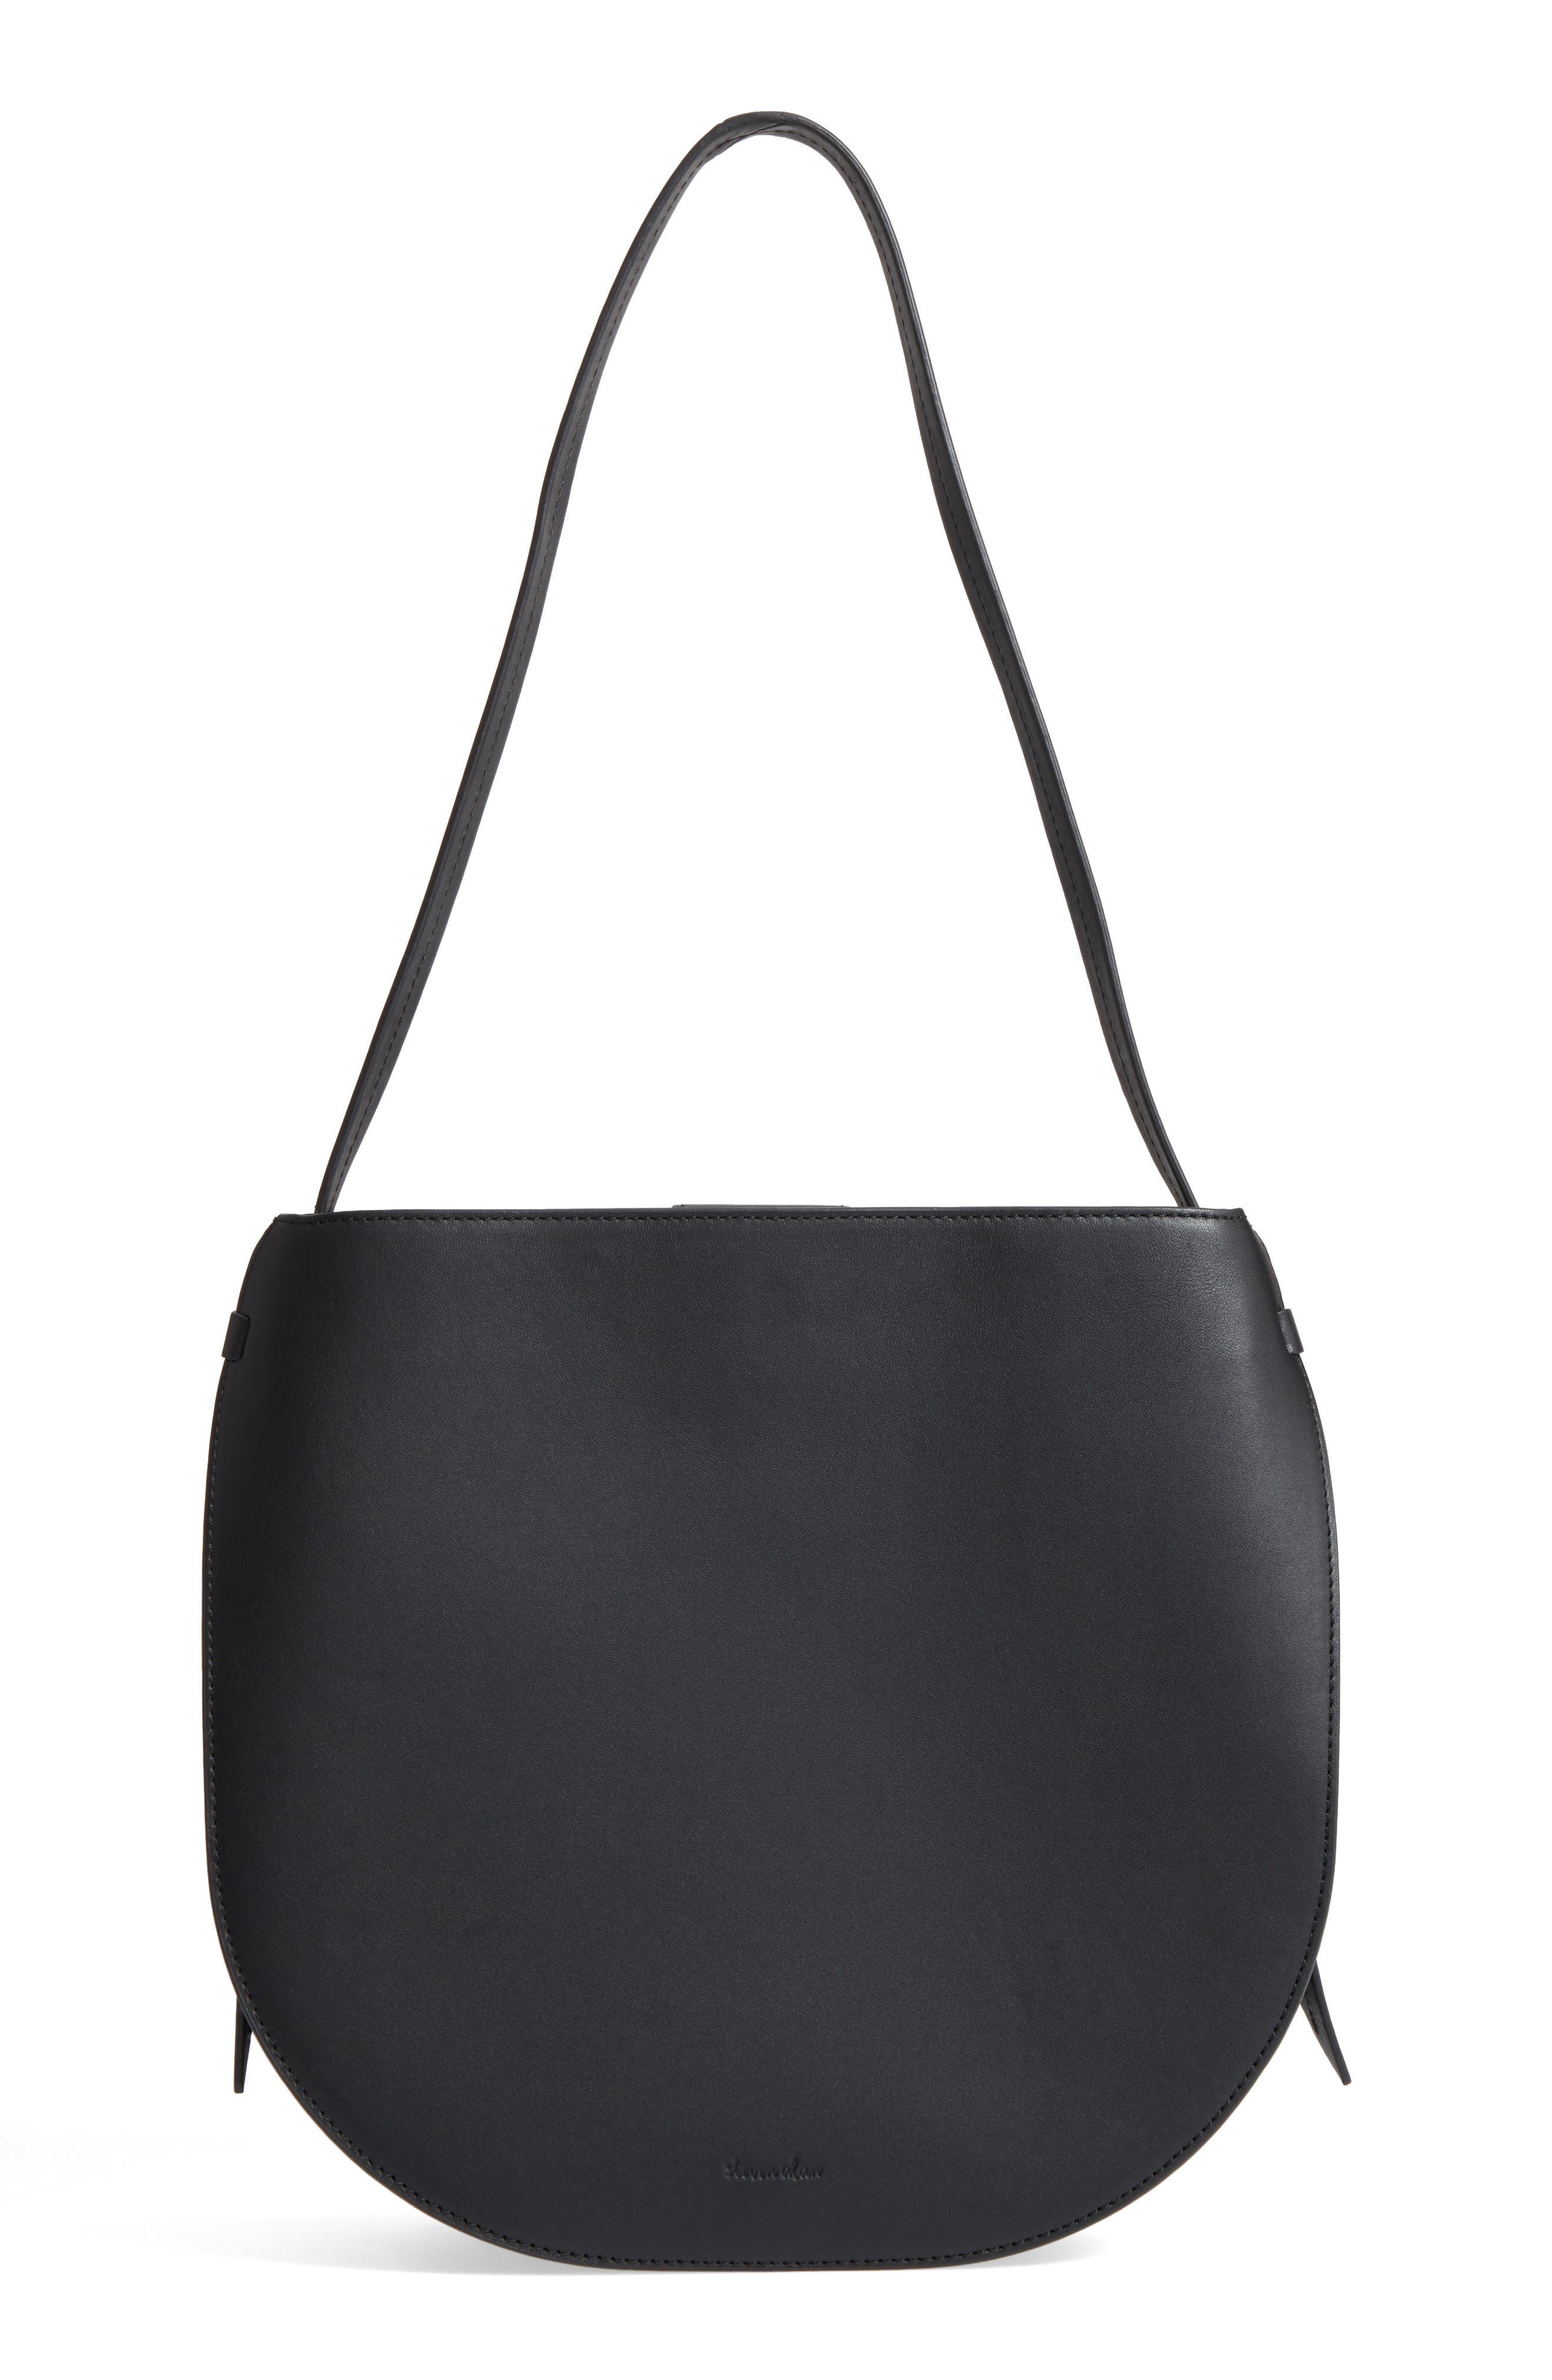 Helena Half Moon Leather Shoulder Bag,                             Main thumbnail 1, color,                             001